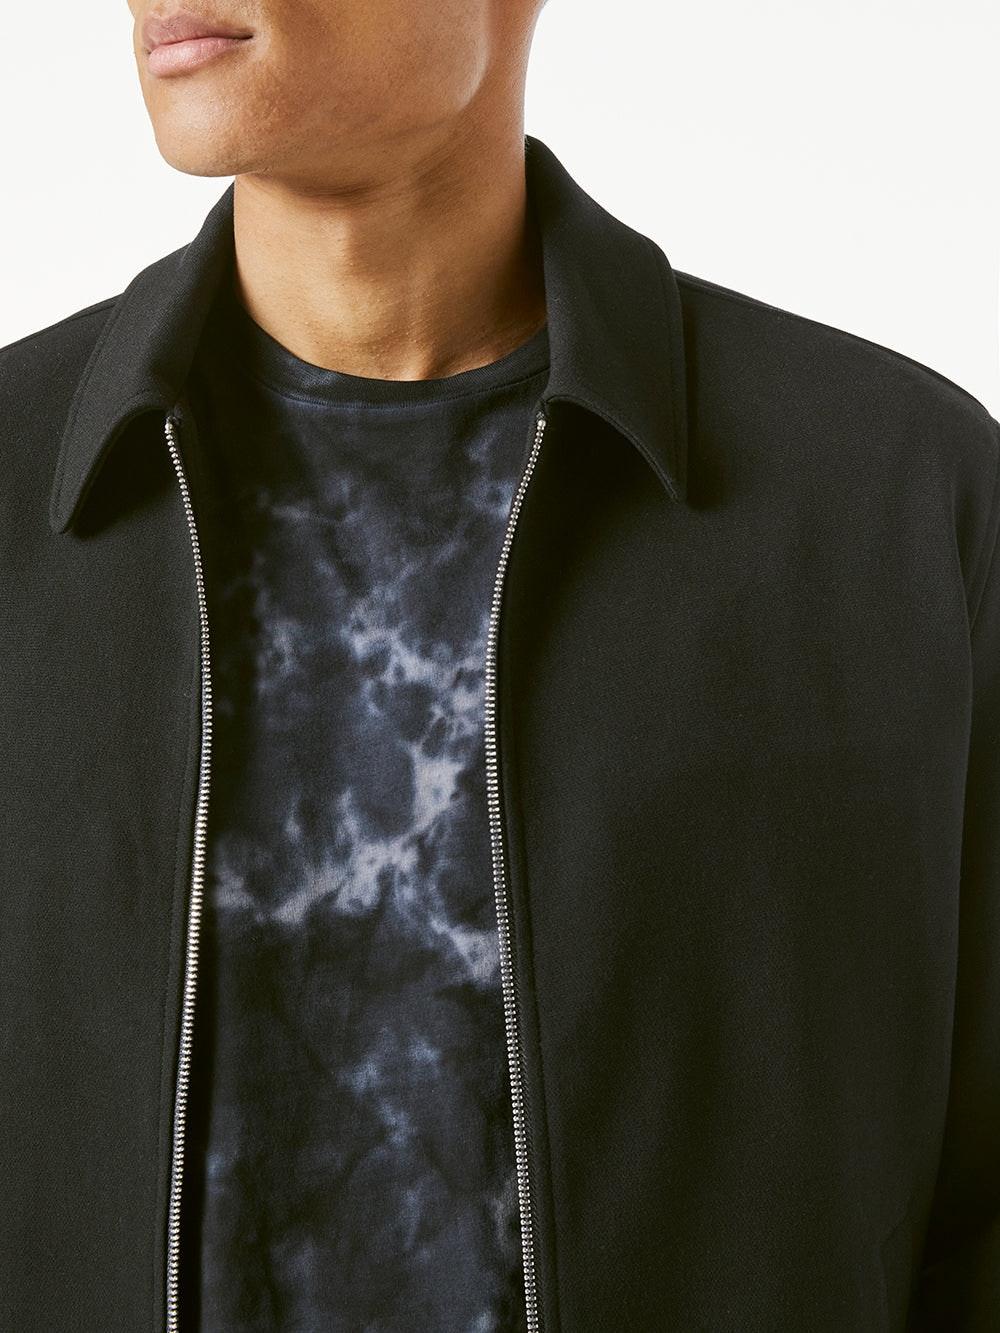 jacket detail view alt:hover